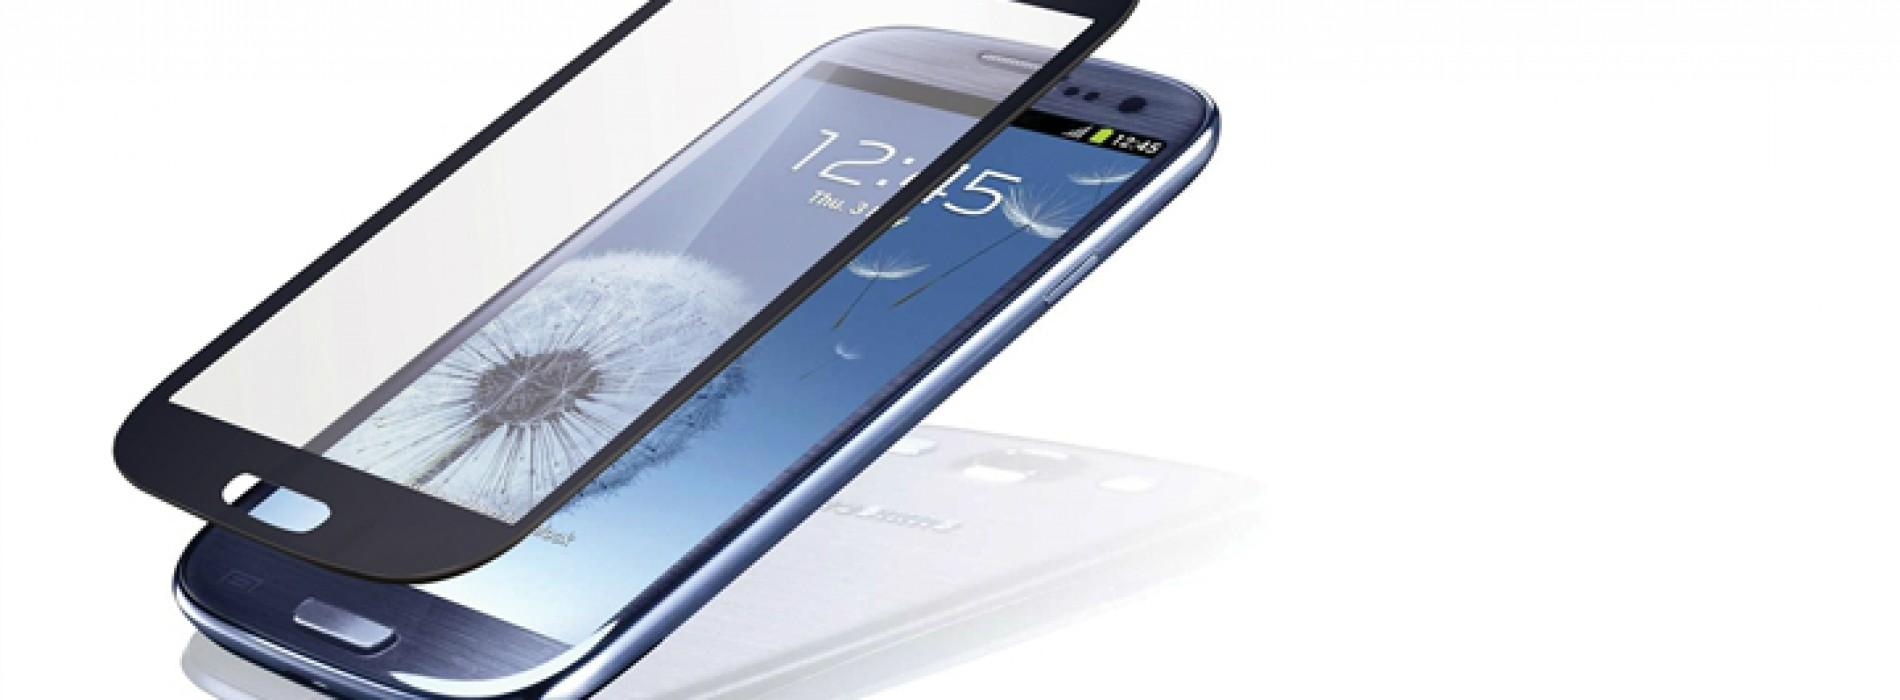 Product Highlight: SEIDIO VITREO for Samsung Galaxy S III